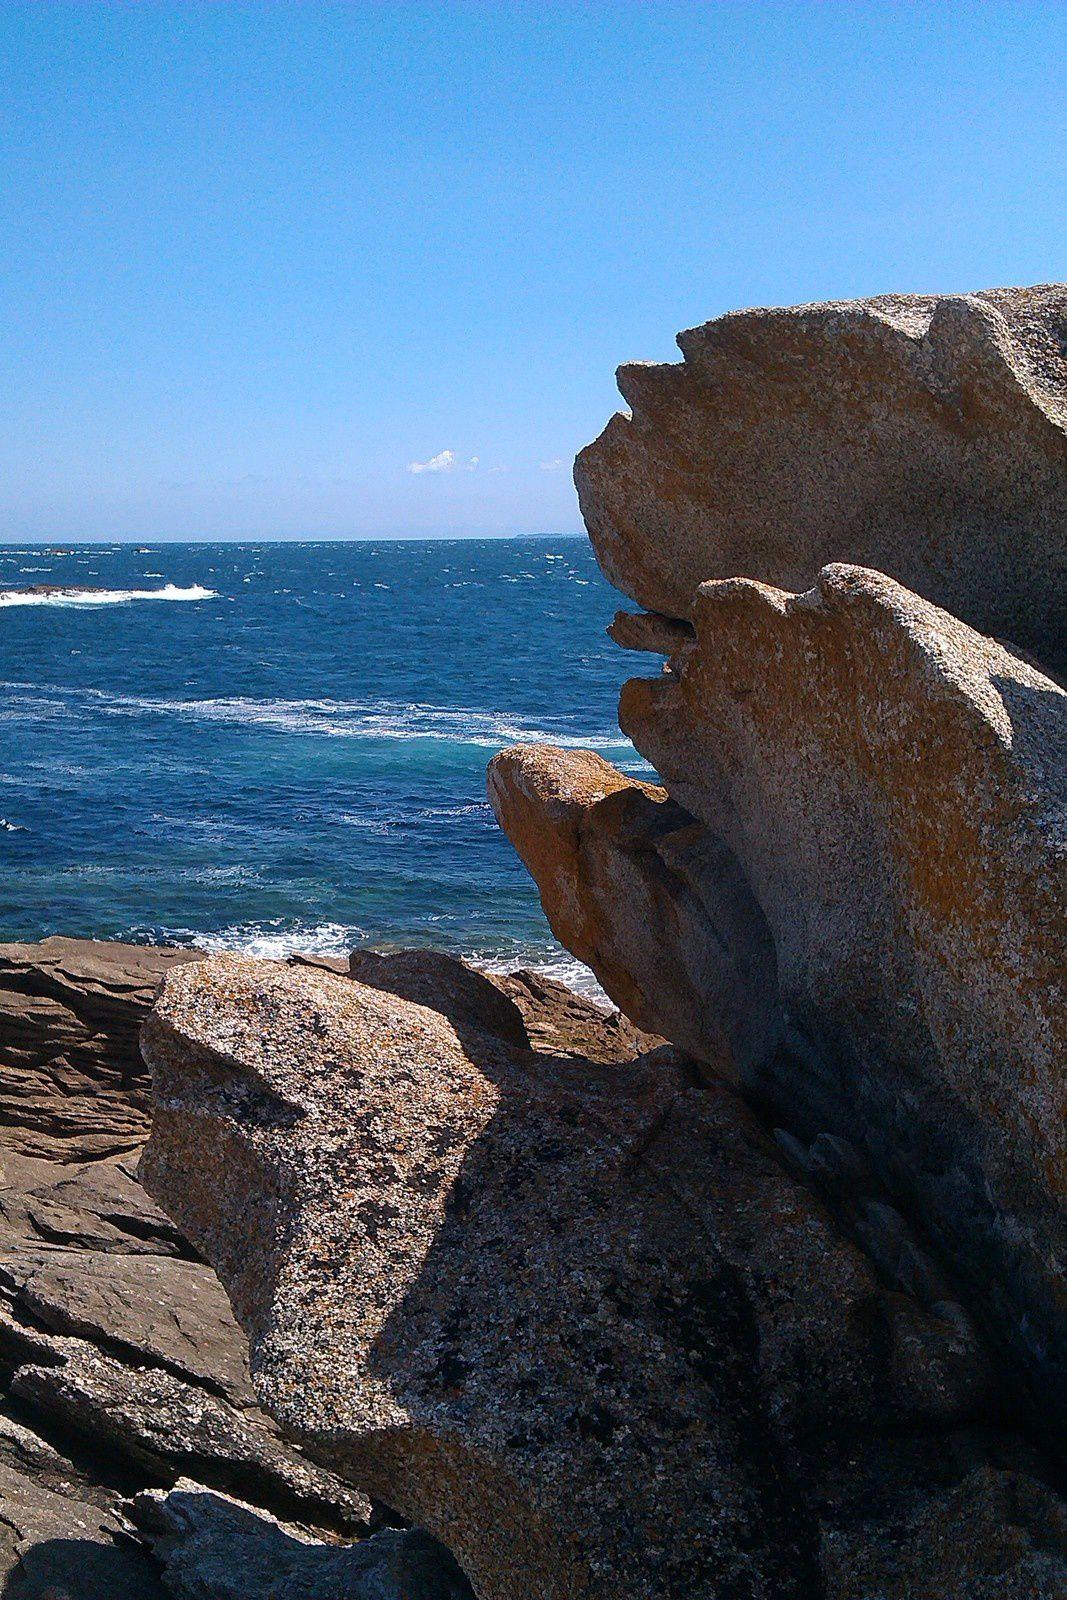 Séjour breton et rockfishing